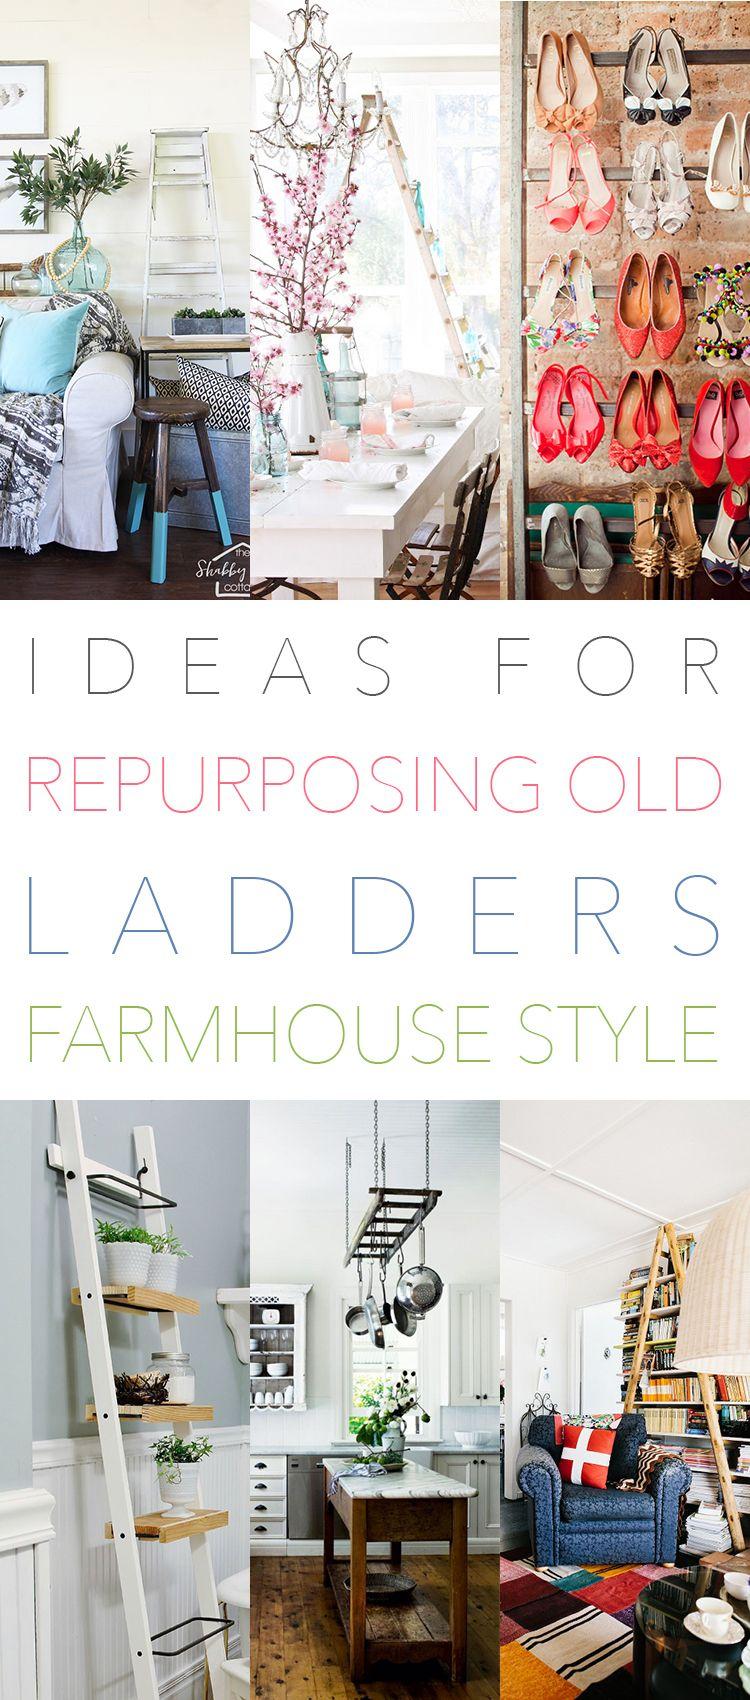 47 Ideas for Repurposing Old Ladders Farmhouse Style + DIYS ...